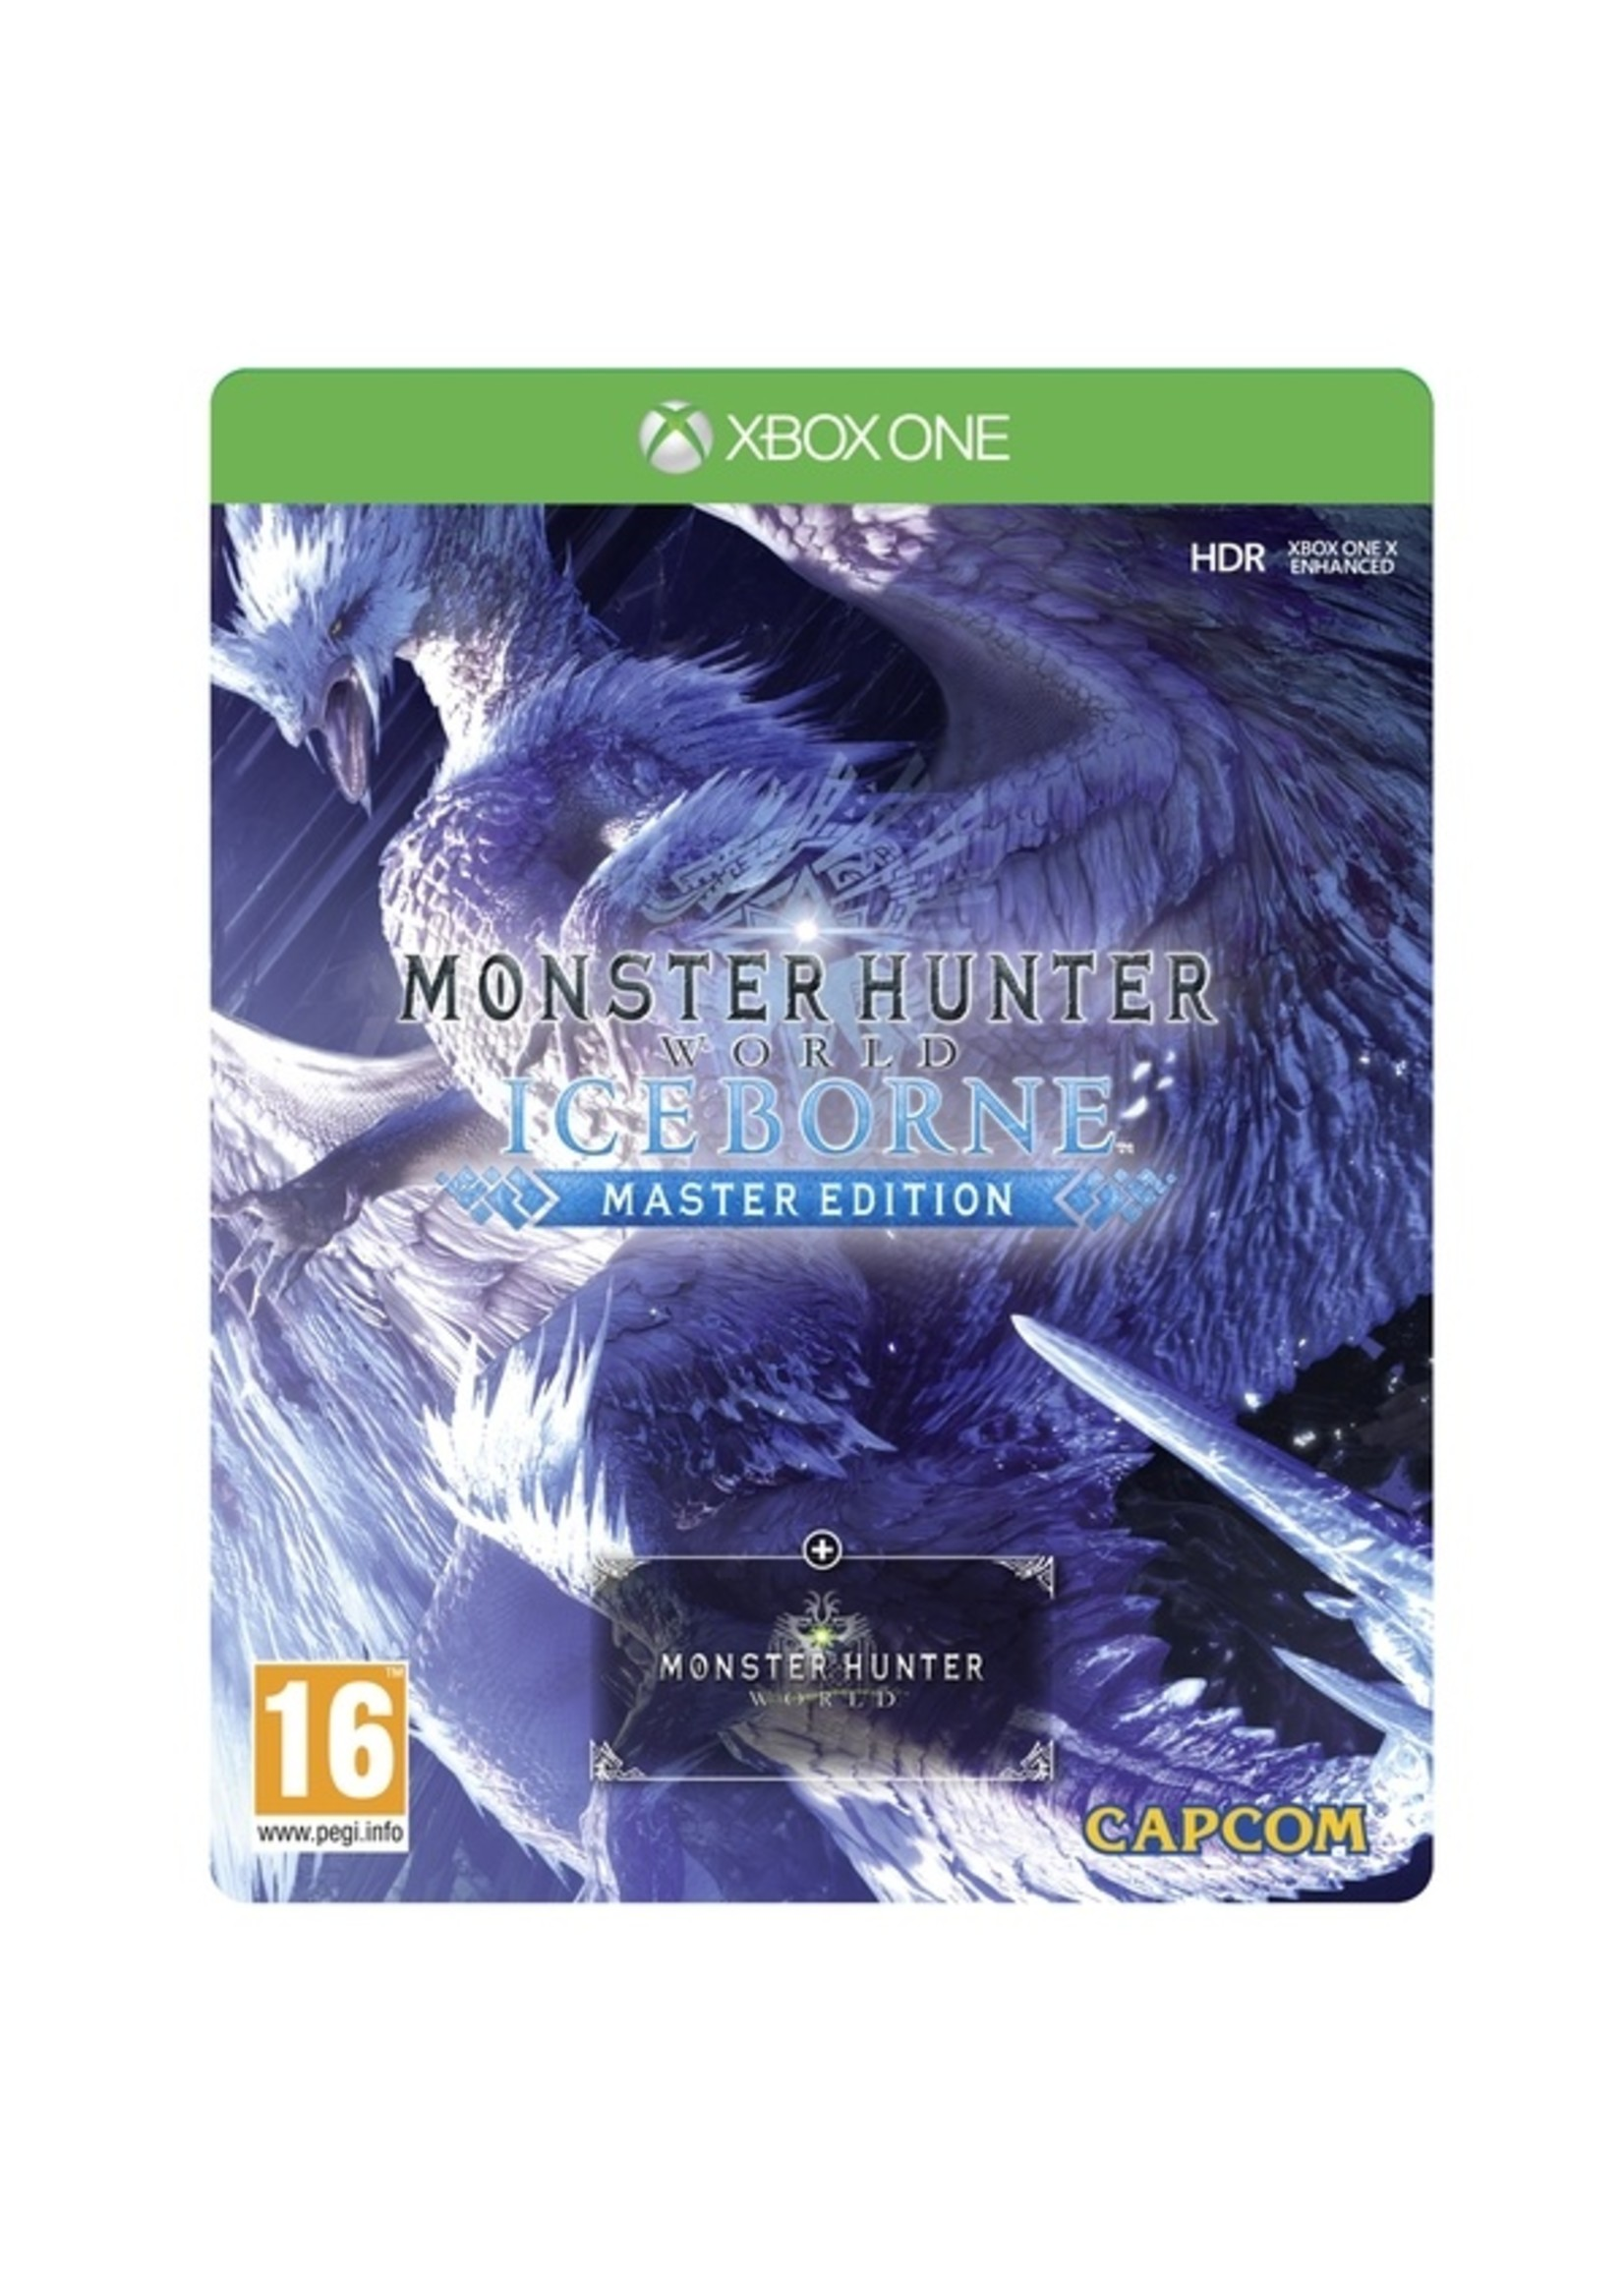 Monster Hunter World: Iceborne Master Edition - XBOne NEW